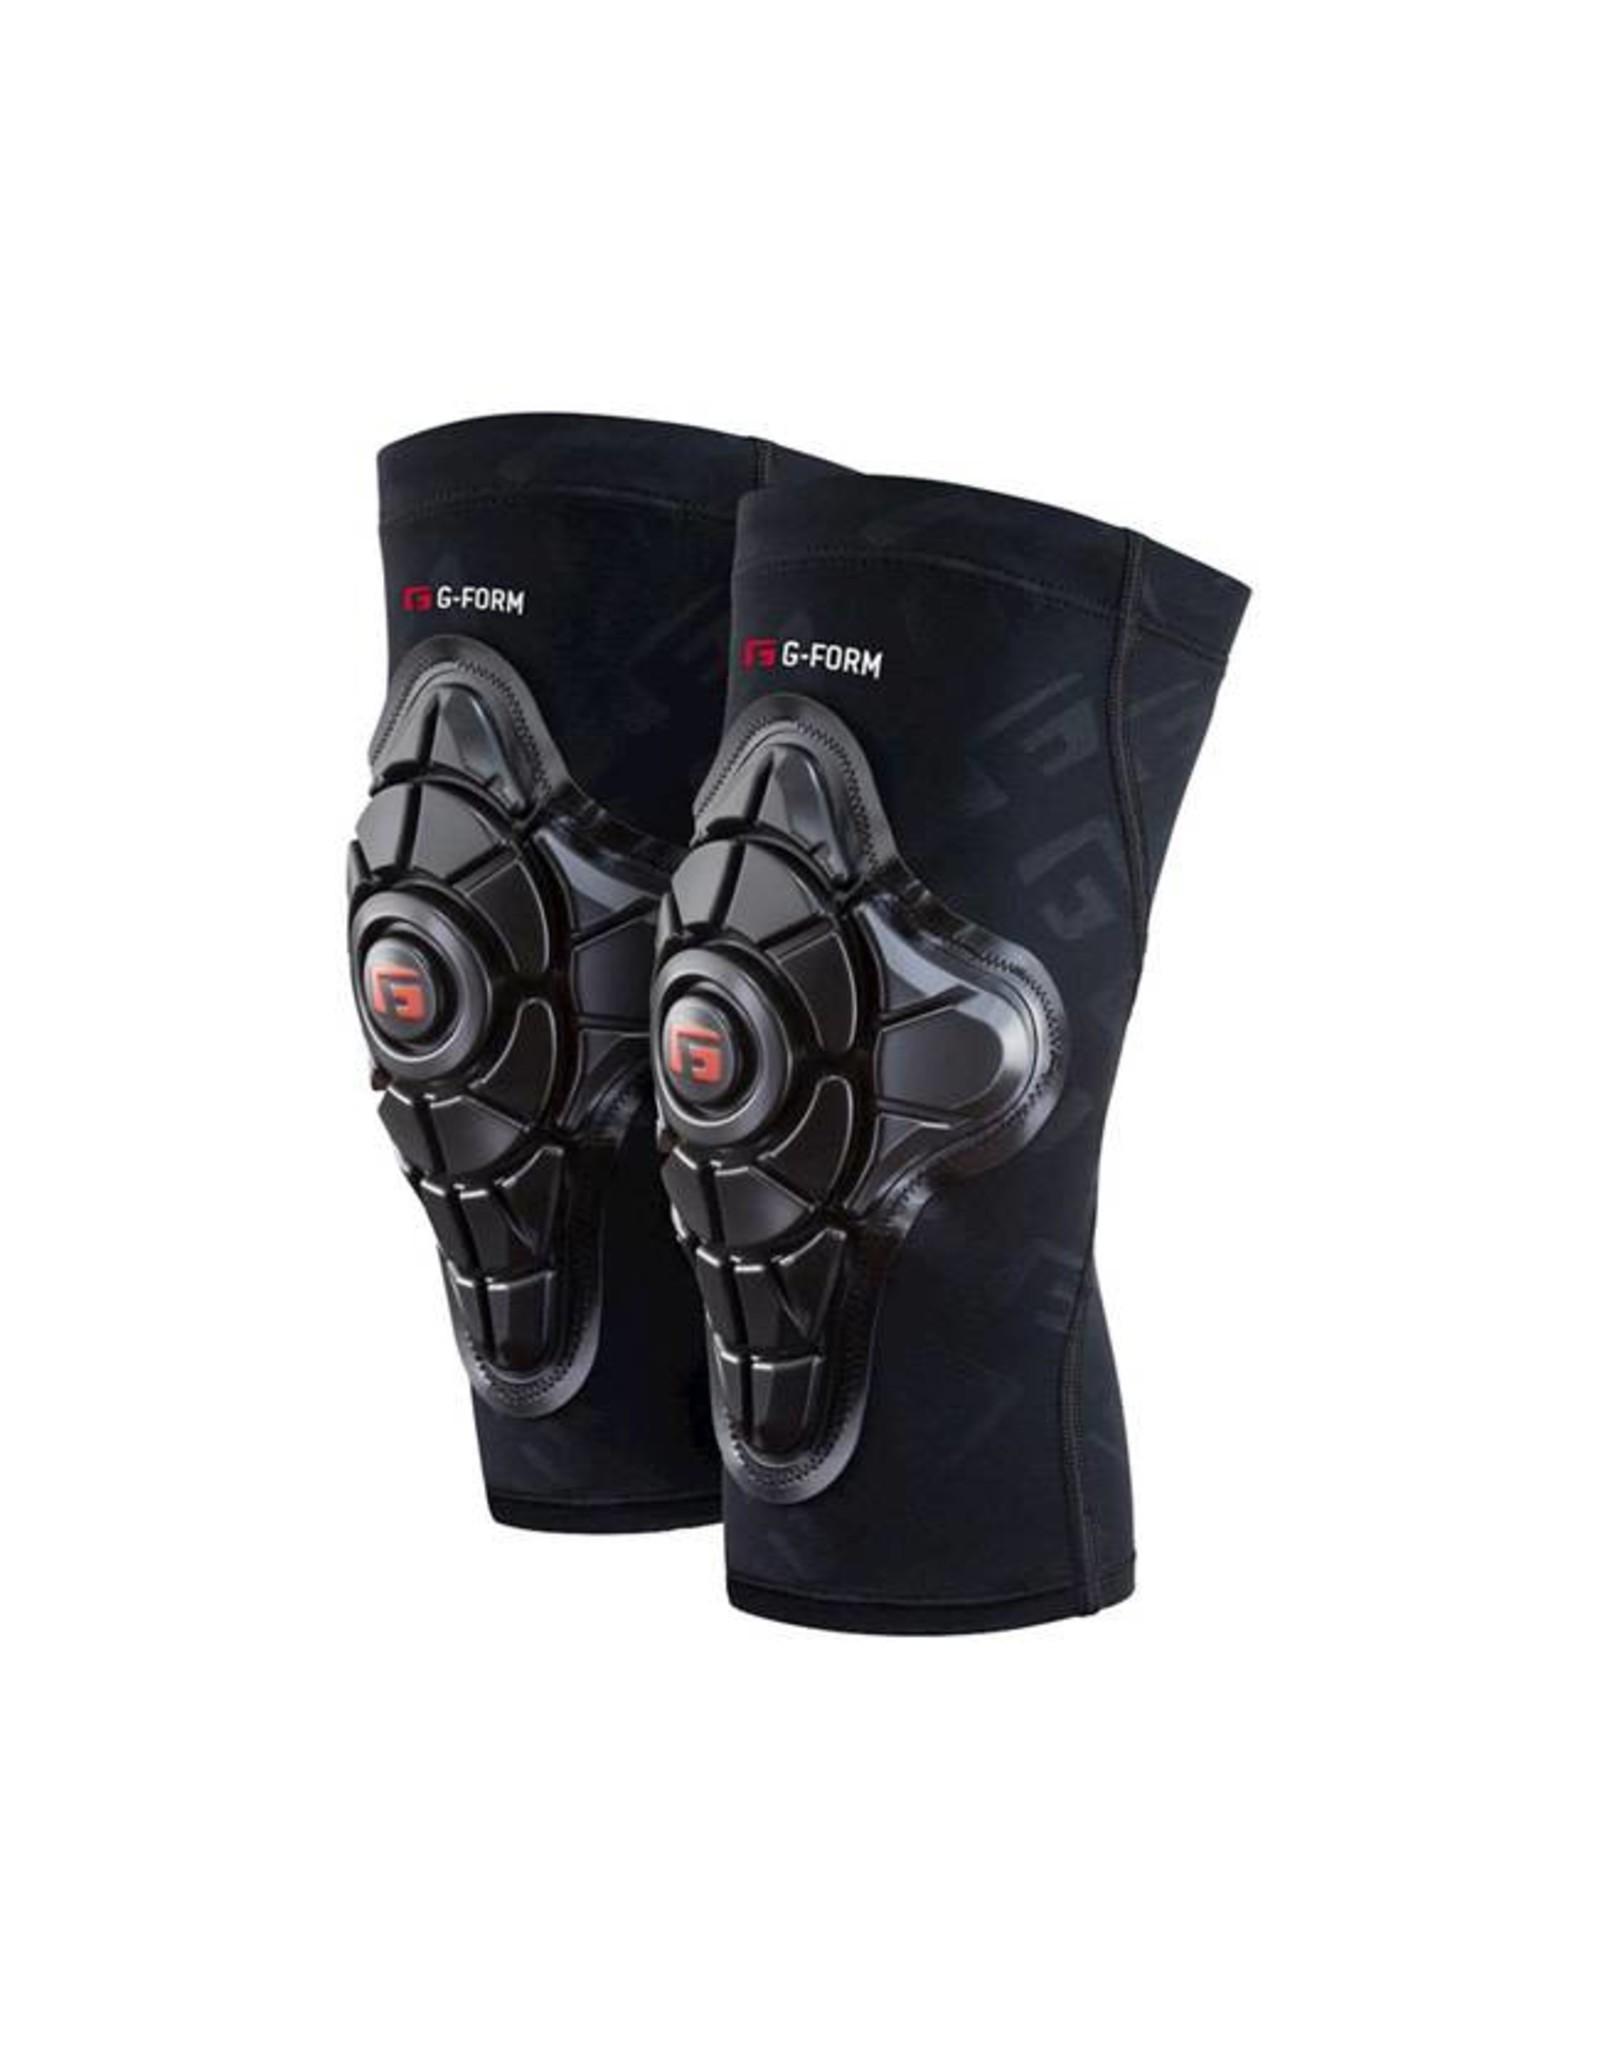 G-Form G-Form Pro-X Youth Knee Pad: Black/Embossed G, LG/XL